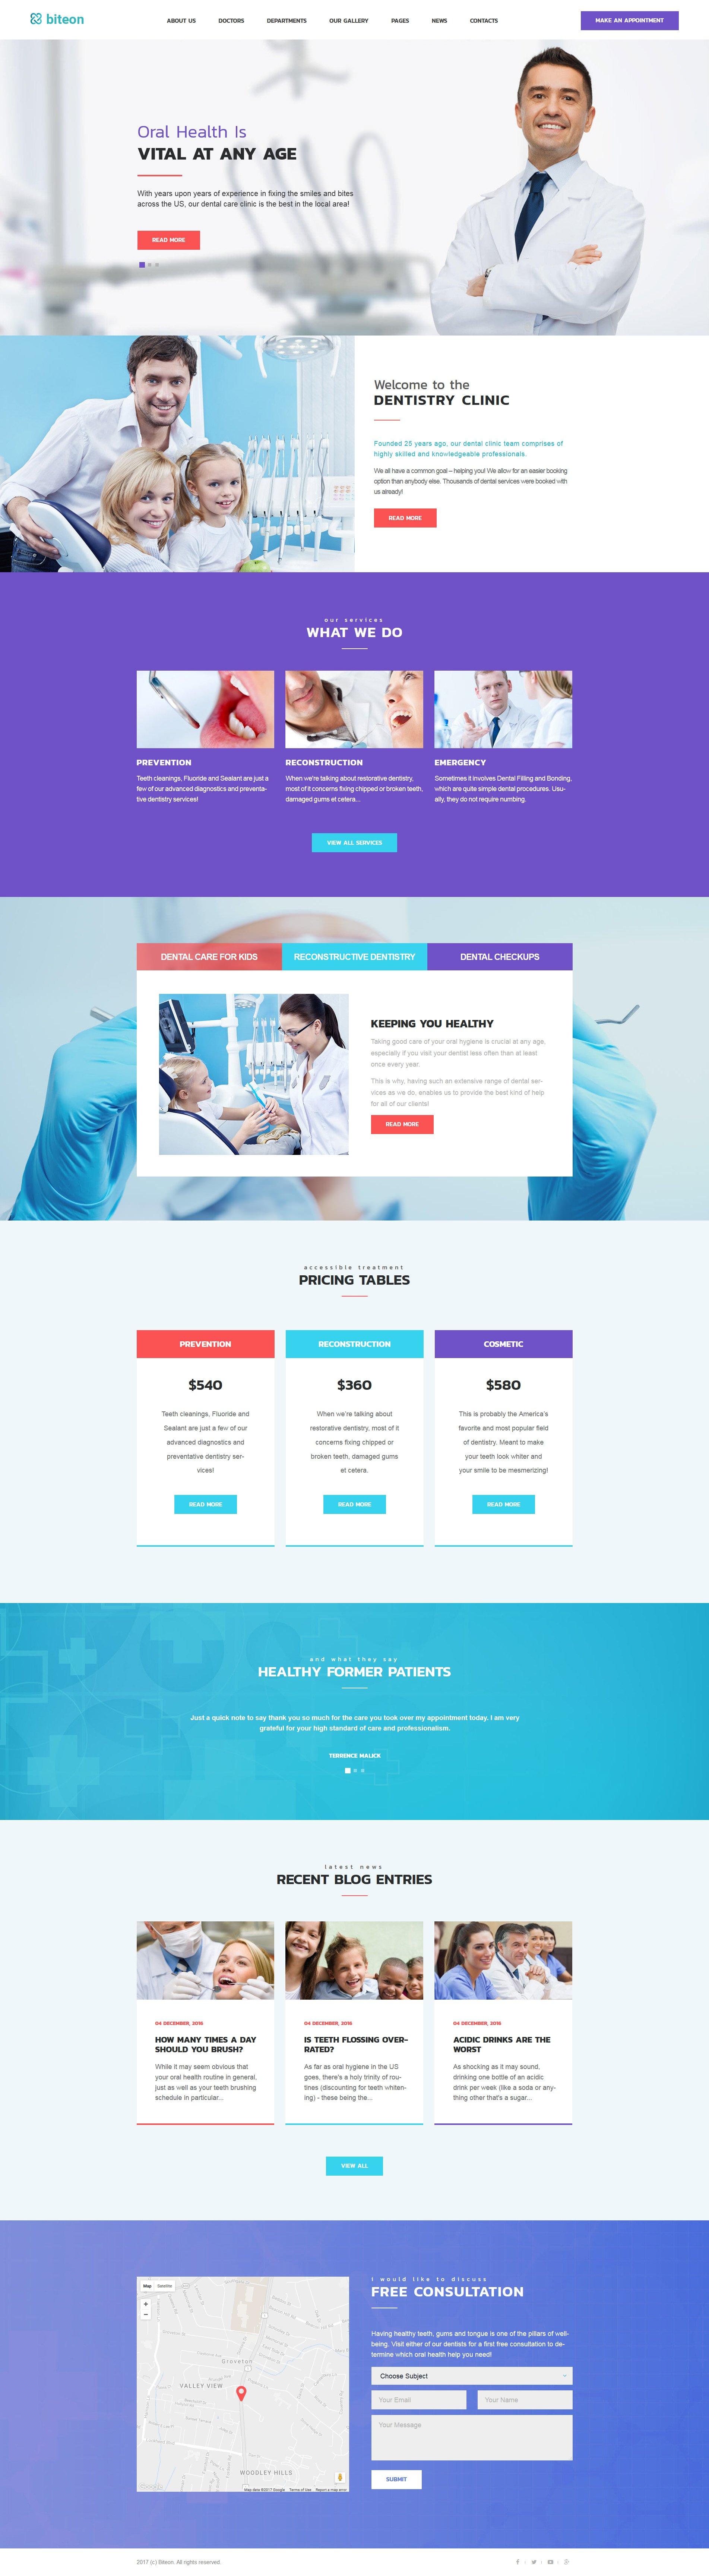 """Biteon - Dentistry Clinic Responsive"" - адаптивний WordPress шаблон №63546"